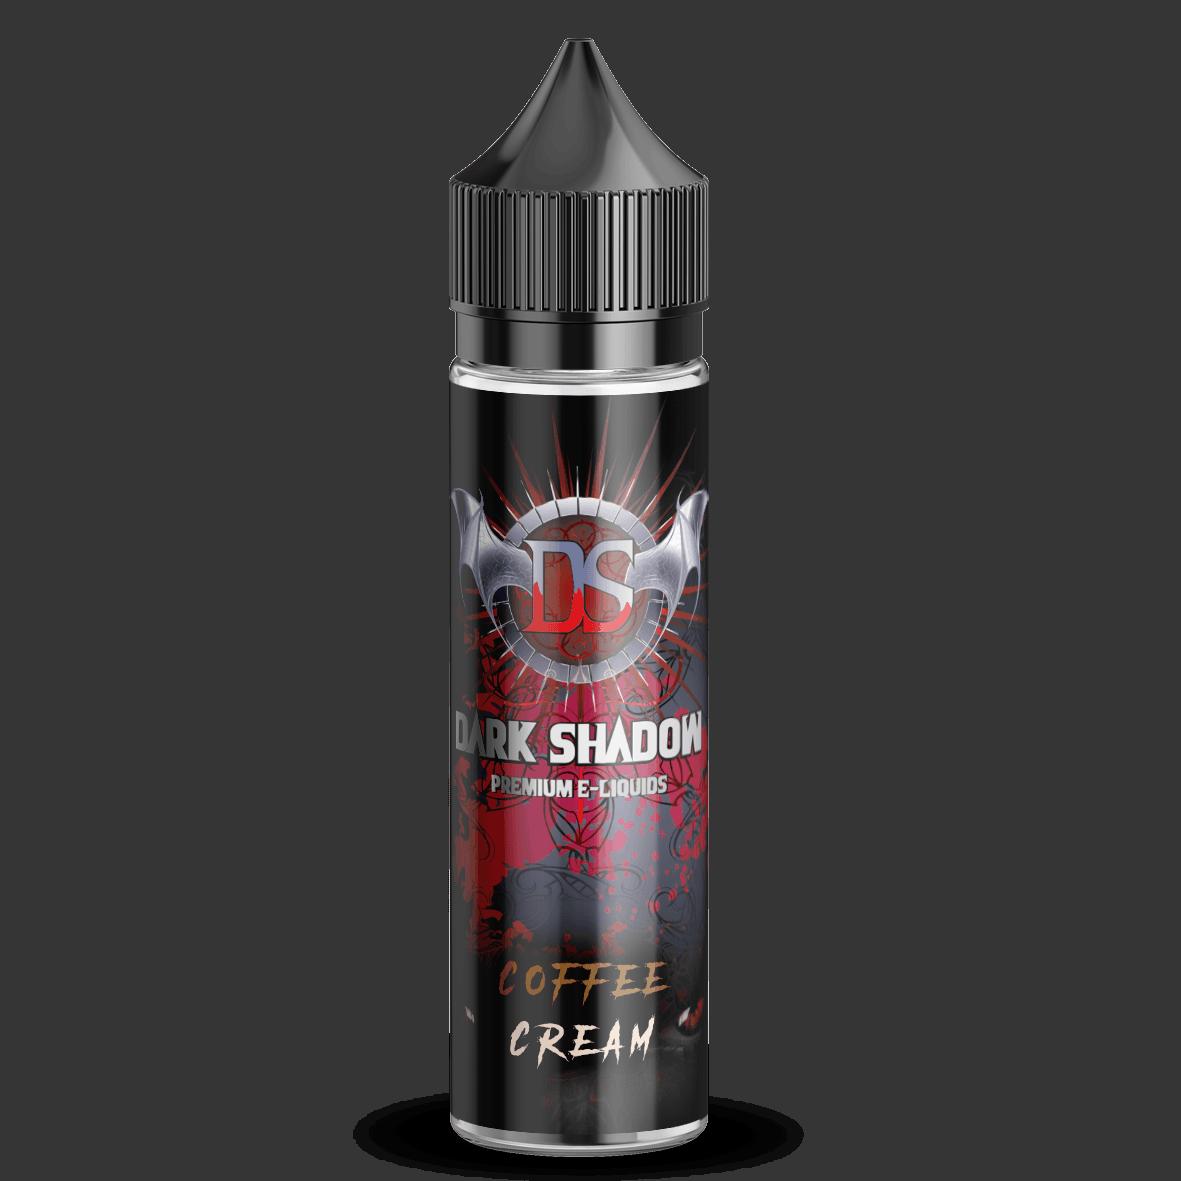 Dark shadow bottle 50ml coffee cream 525x525 - Coffee Cream E-Liquid by Dark Shadow